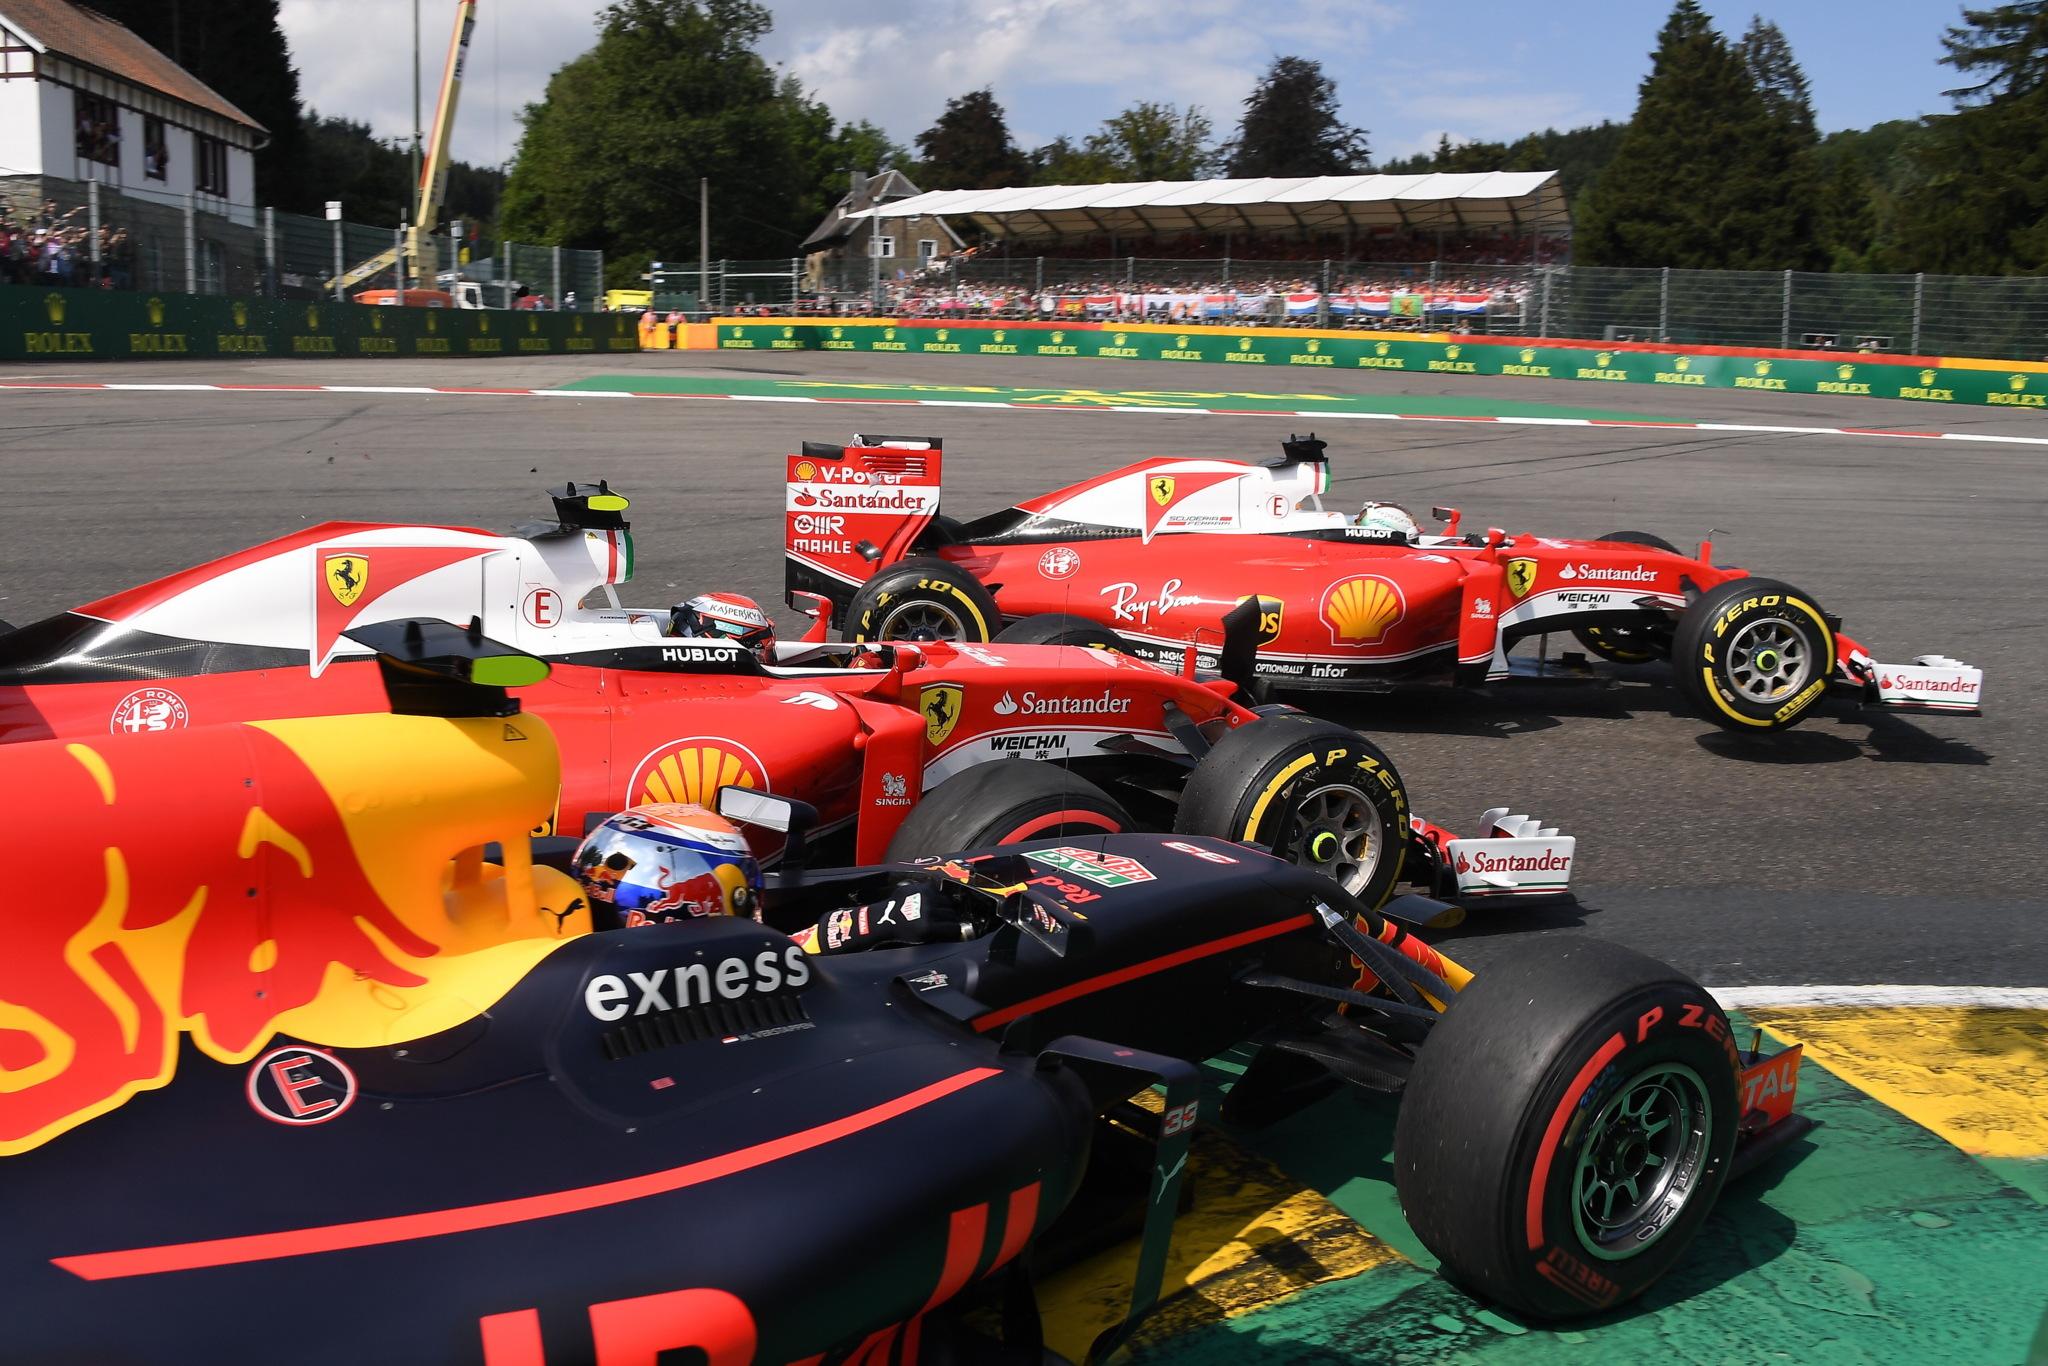 Encontronazo entre Vettel, Raikkonen y Verstappen en Spa